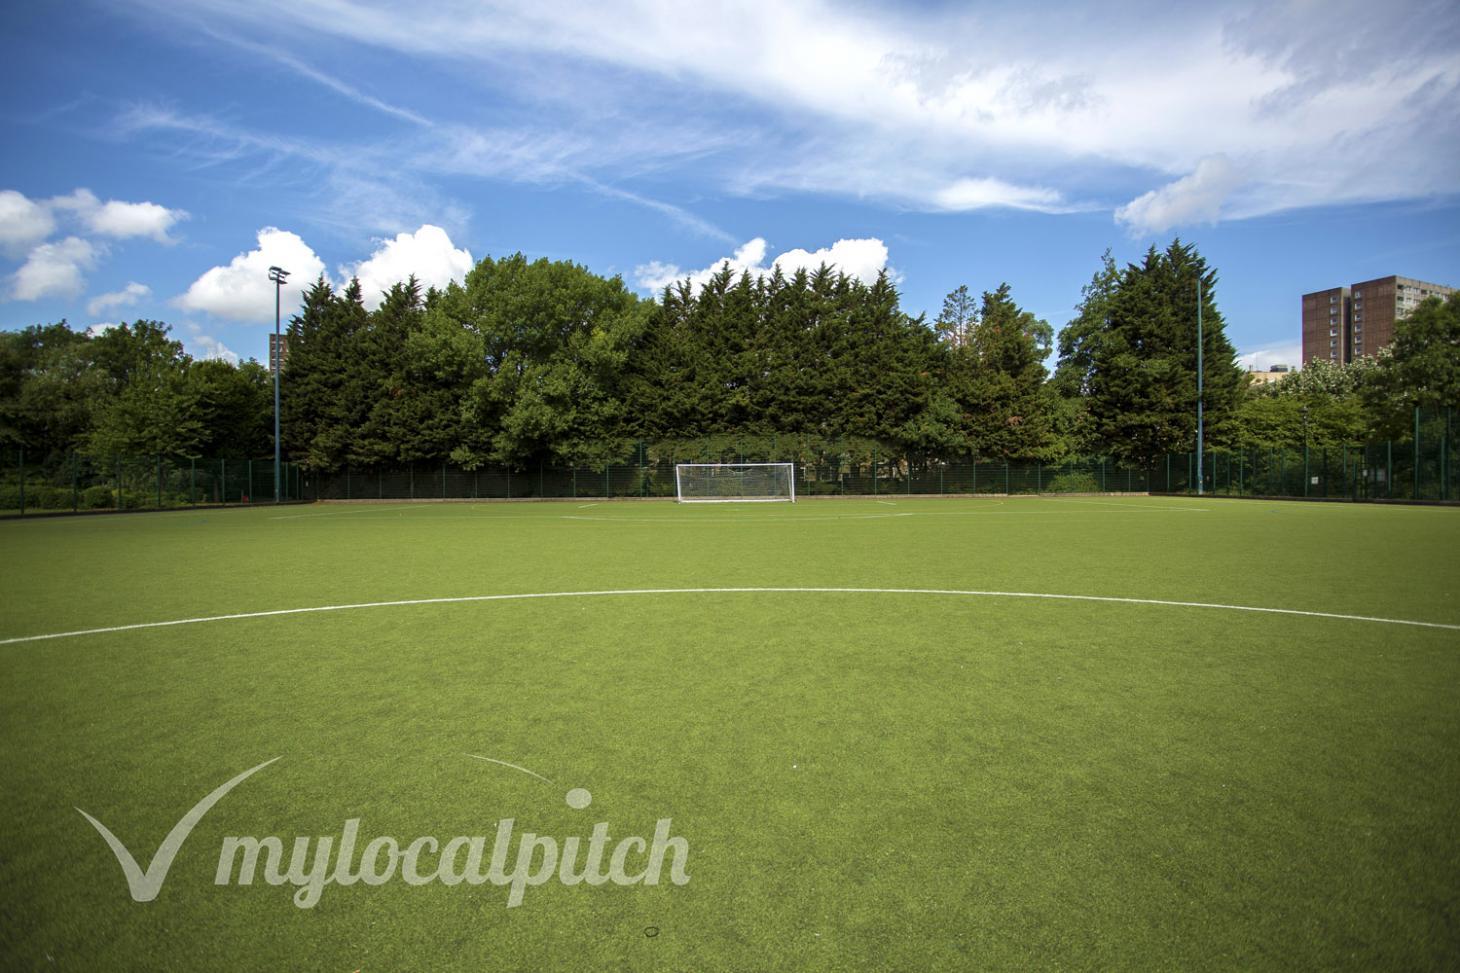 Paddington Recreation Ground 11 a side | 3G Astroturf football pitch